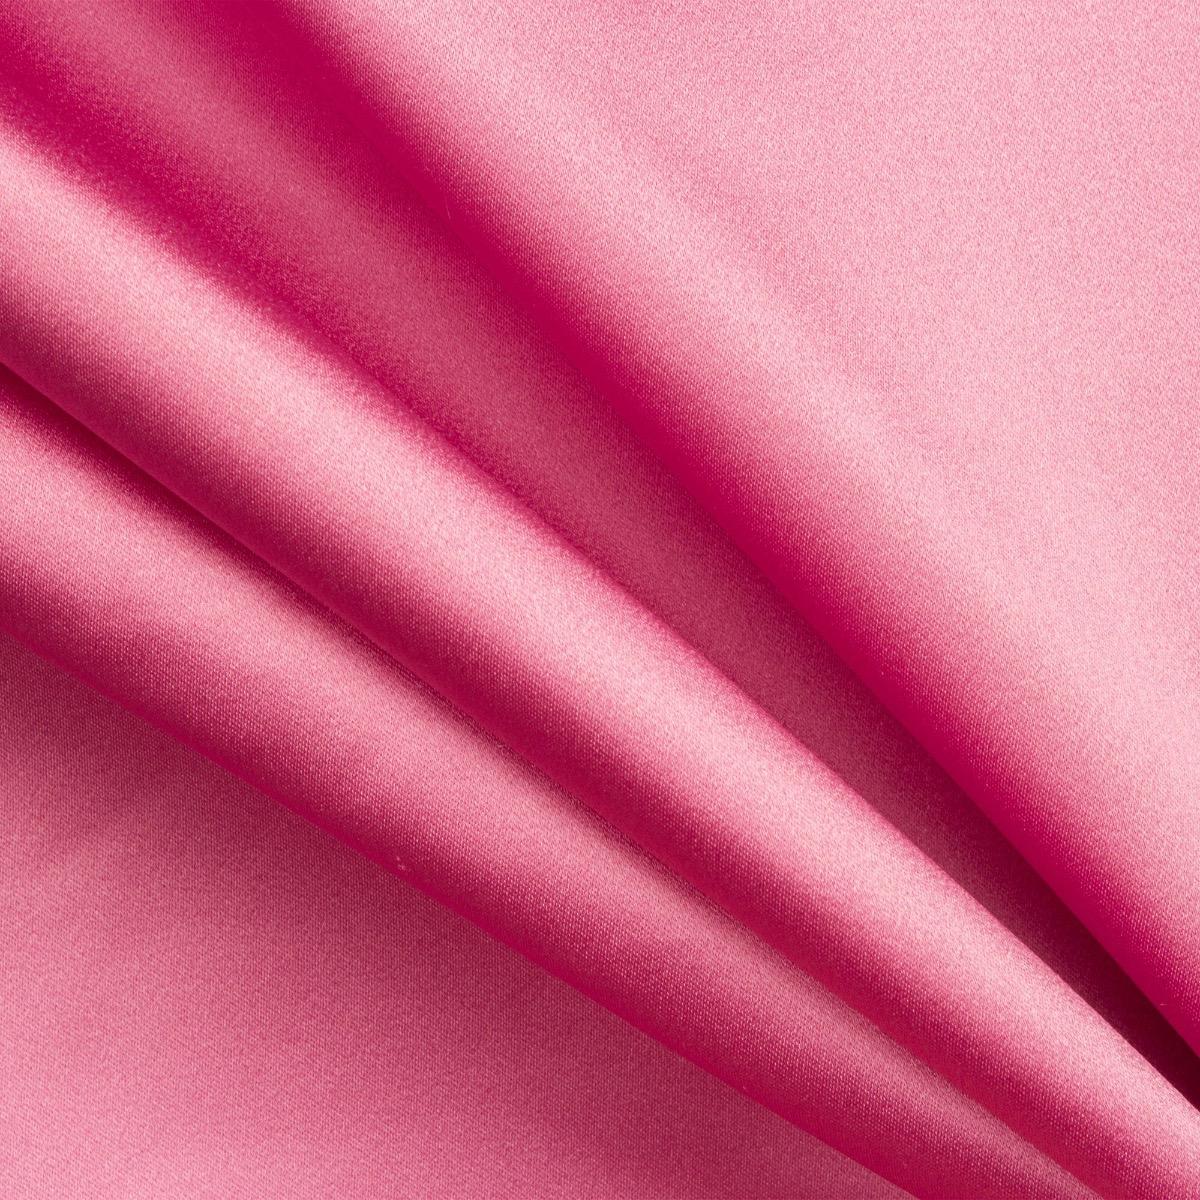 Bubble Gum Pink Silk Duchess Satin